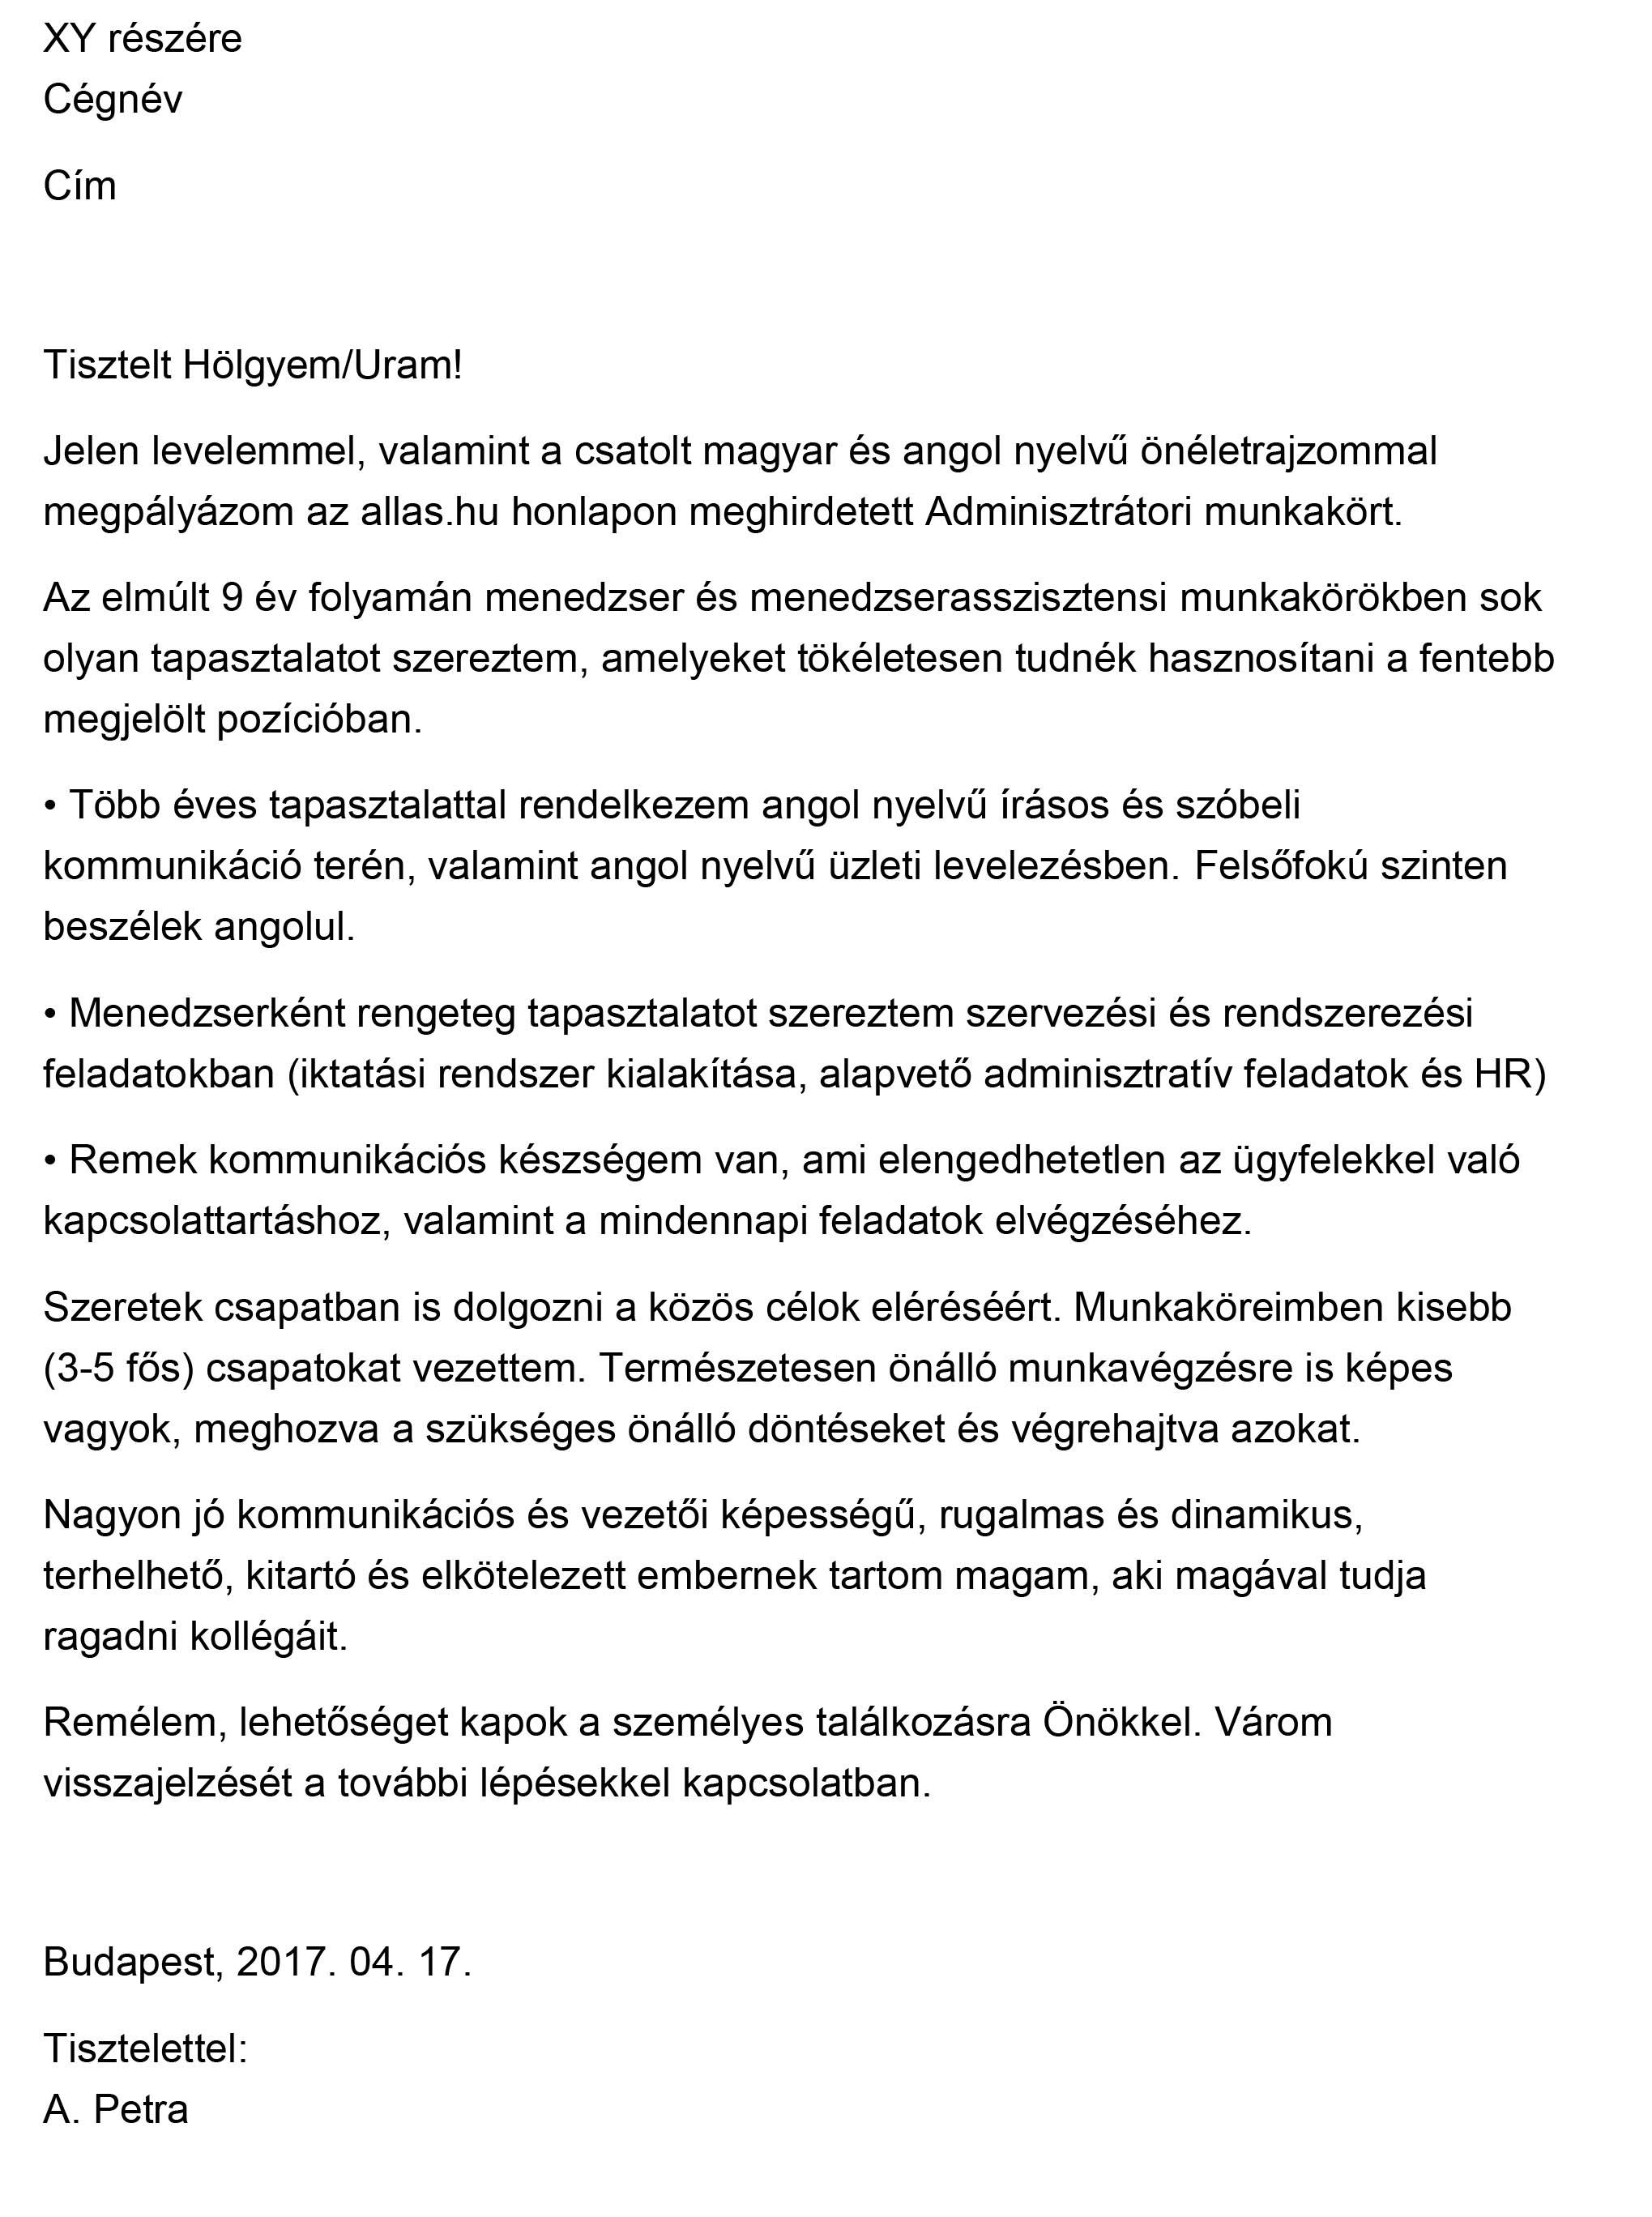 eszter_moti_level.jpg